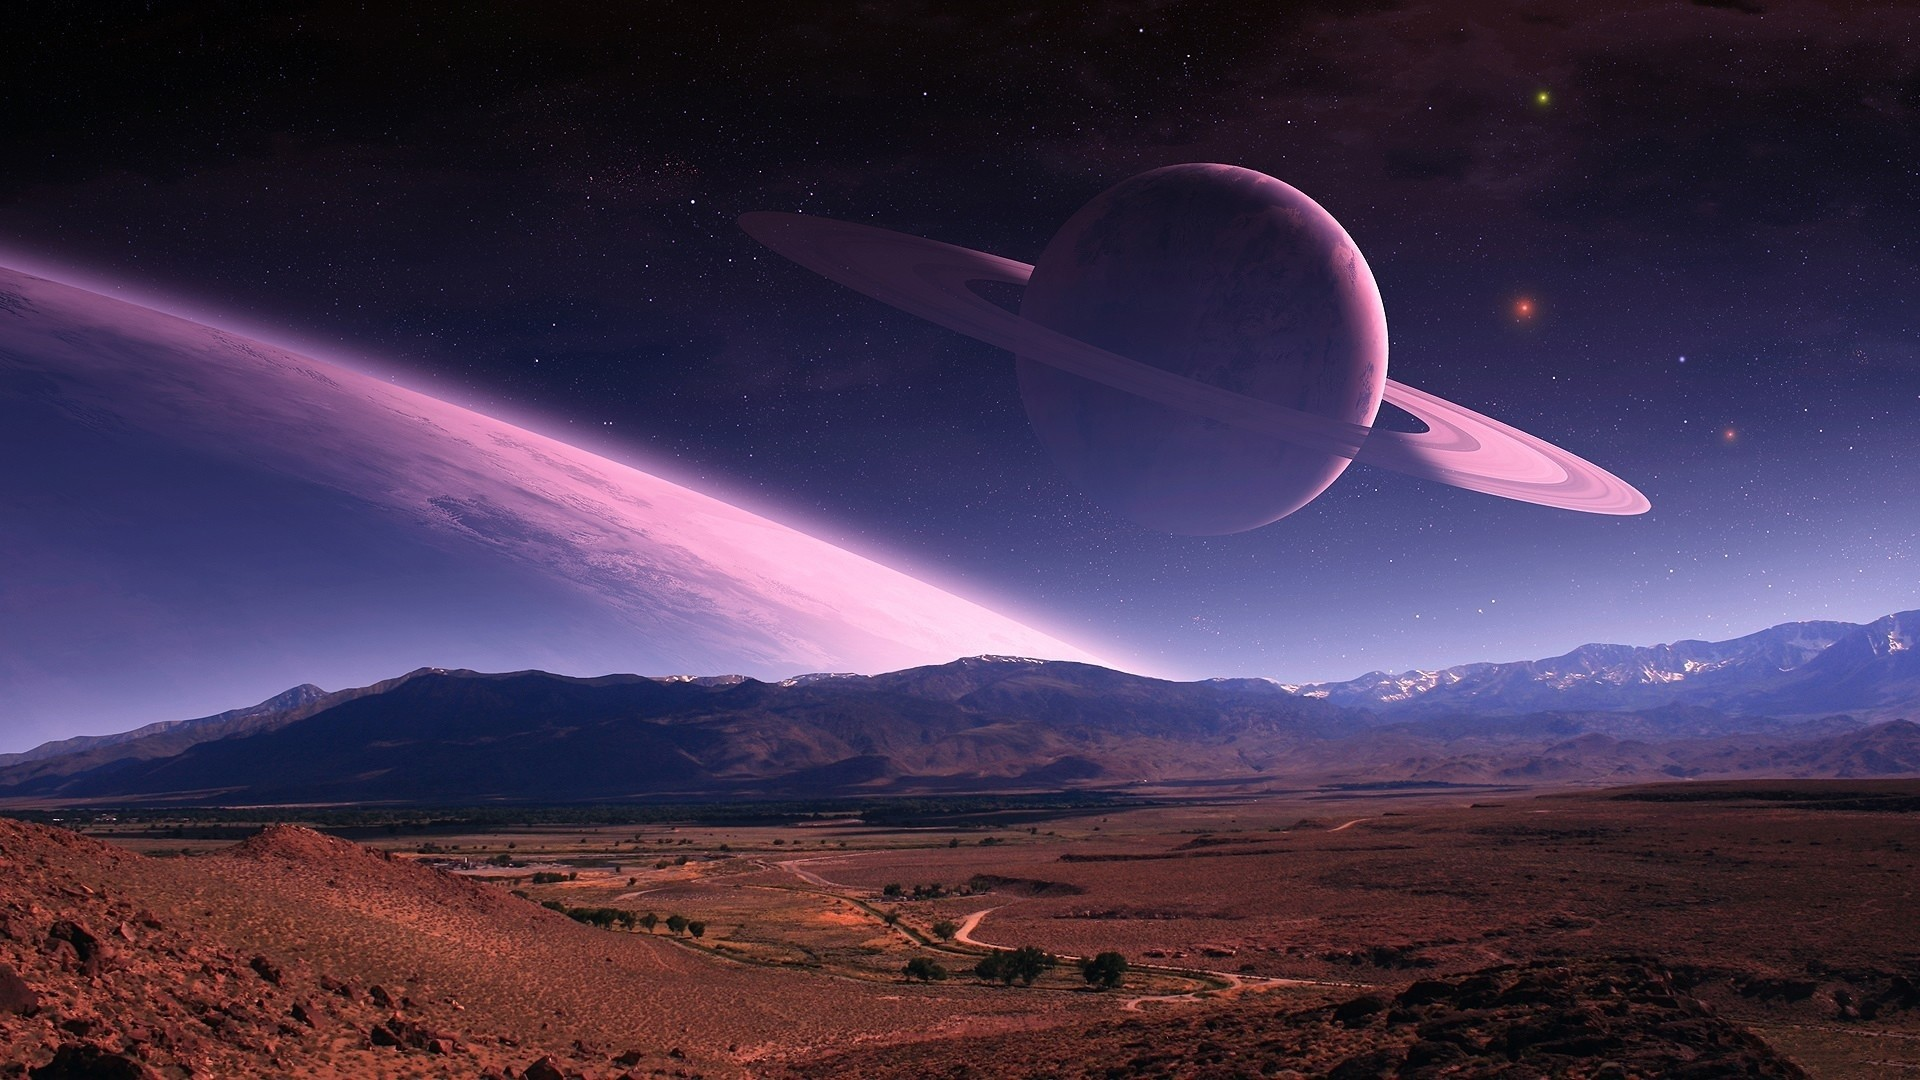 Planet wallpaper ·① Download free beautiful HD wallpapers ...